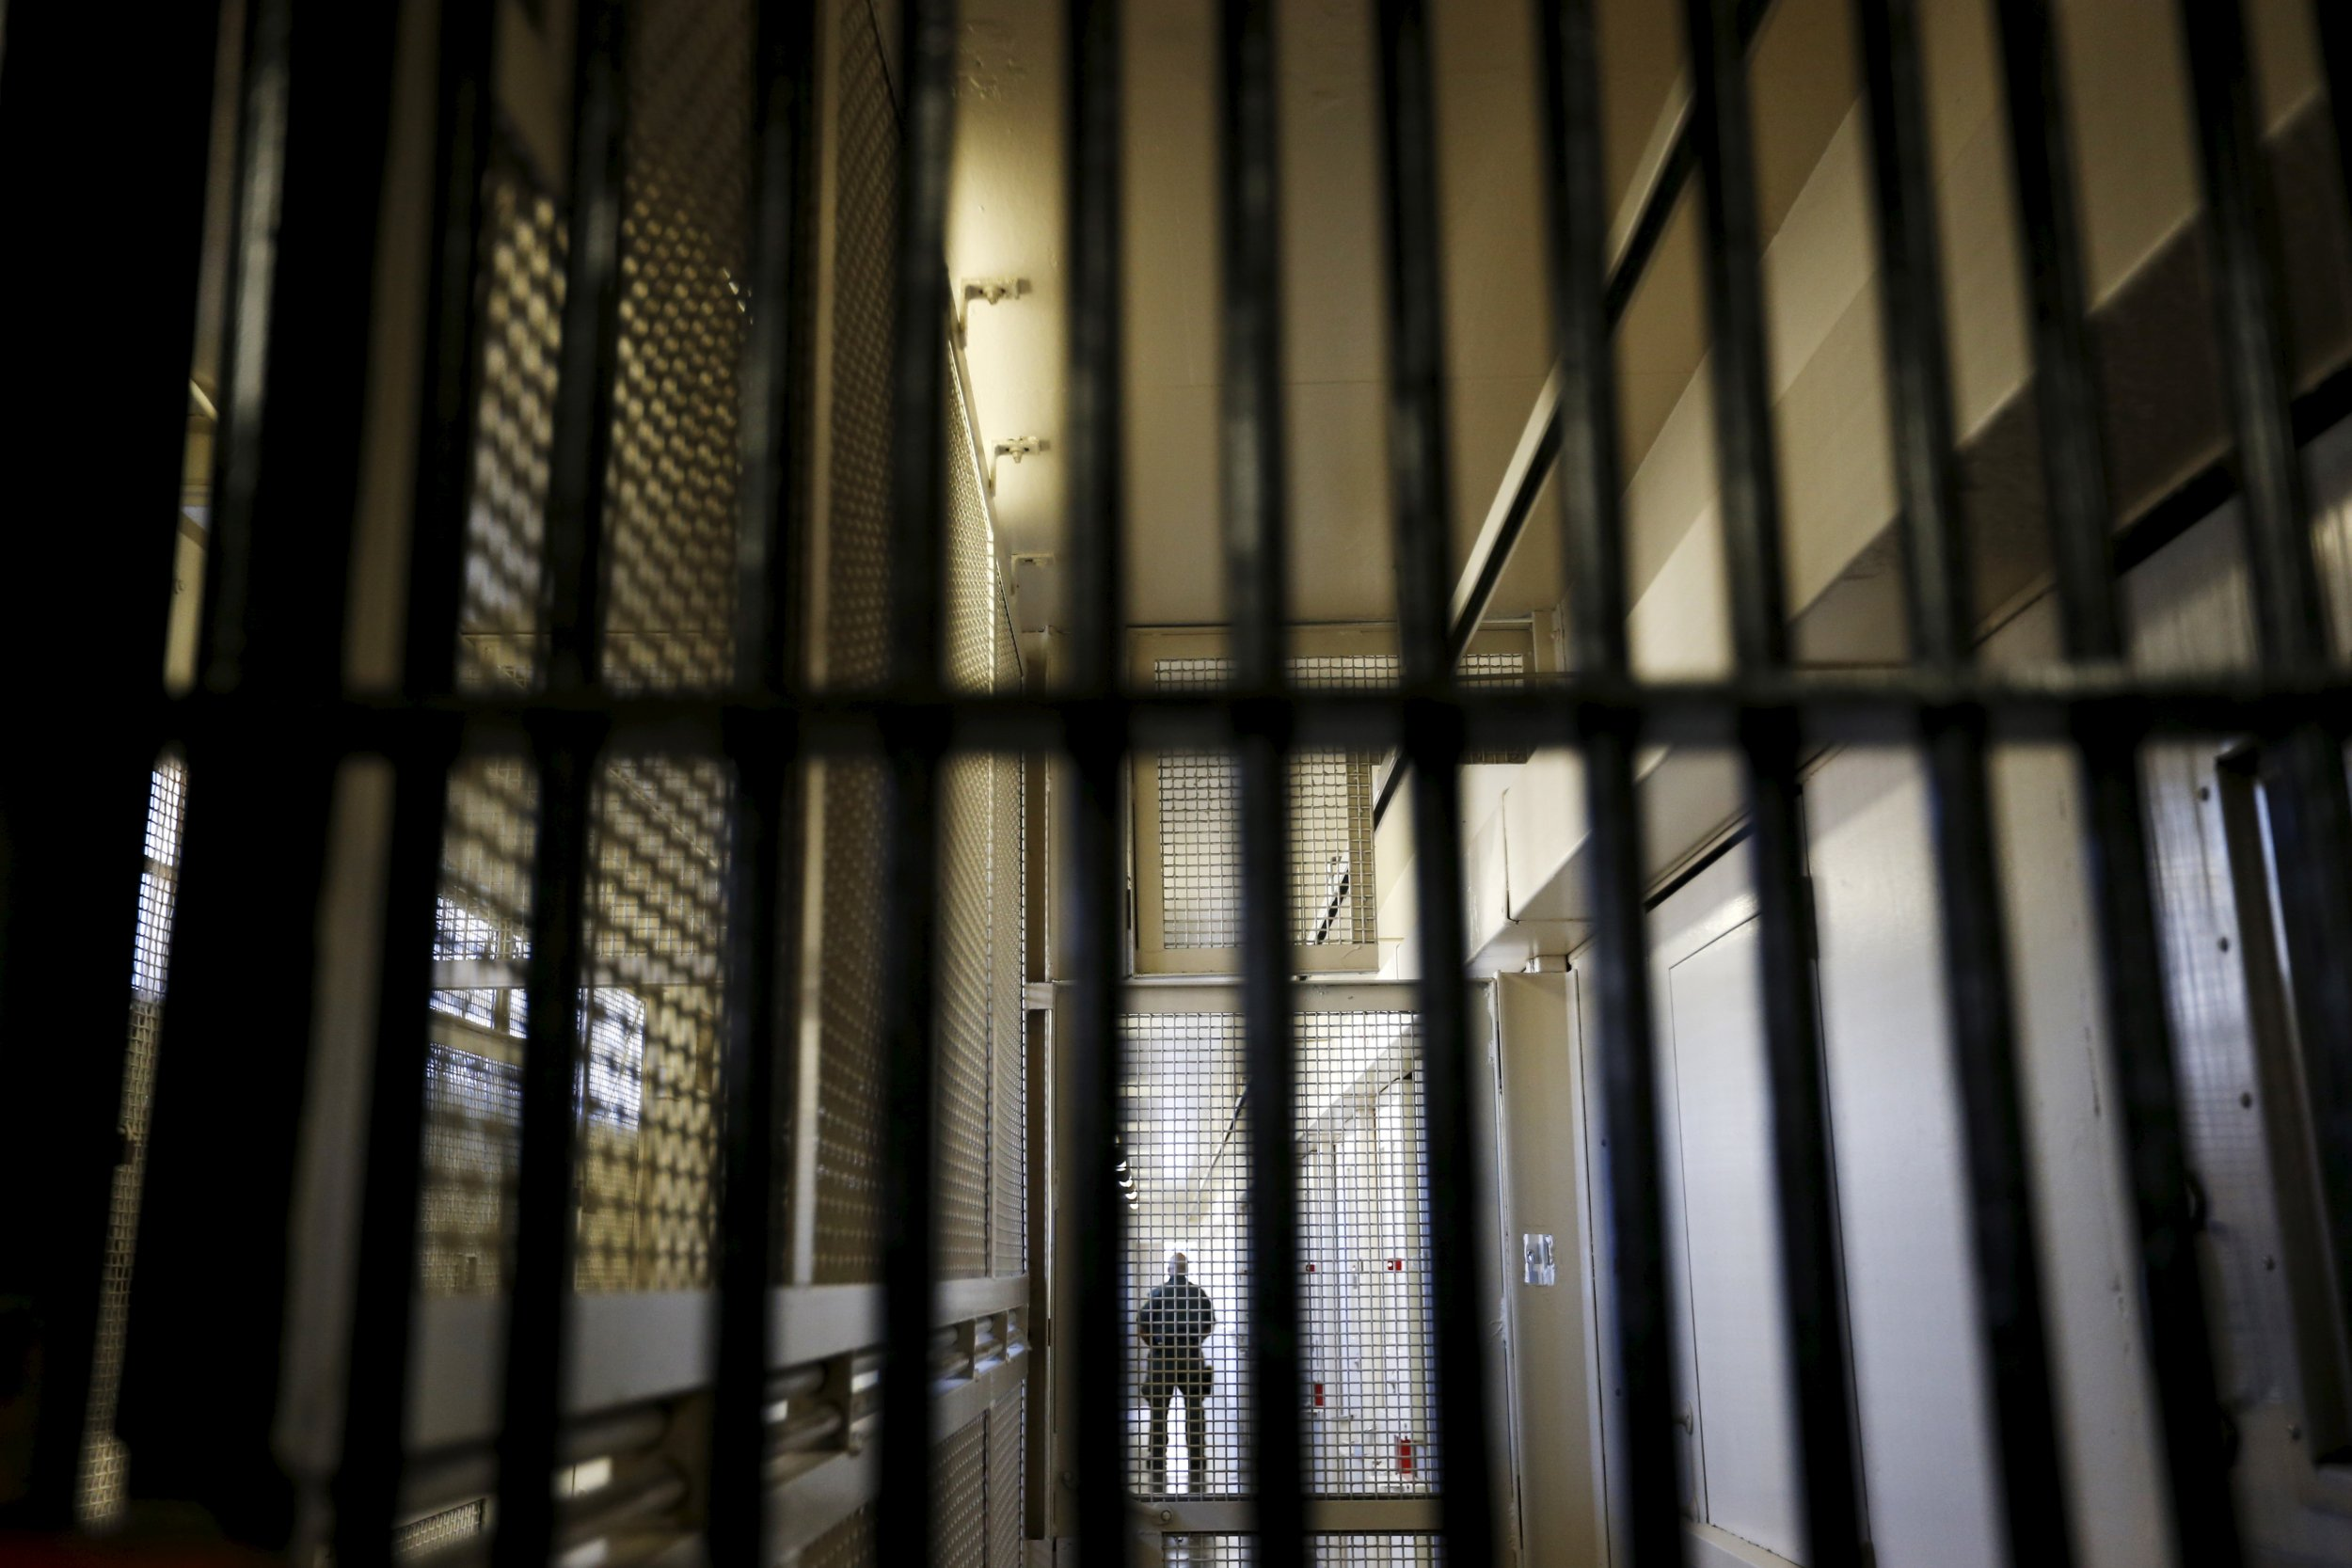 11_28_Prison_Qualified_Immunity